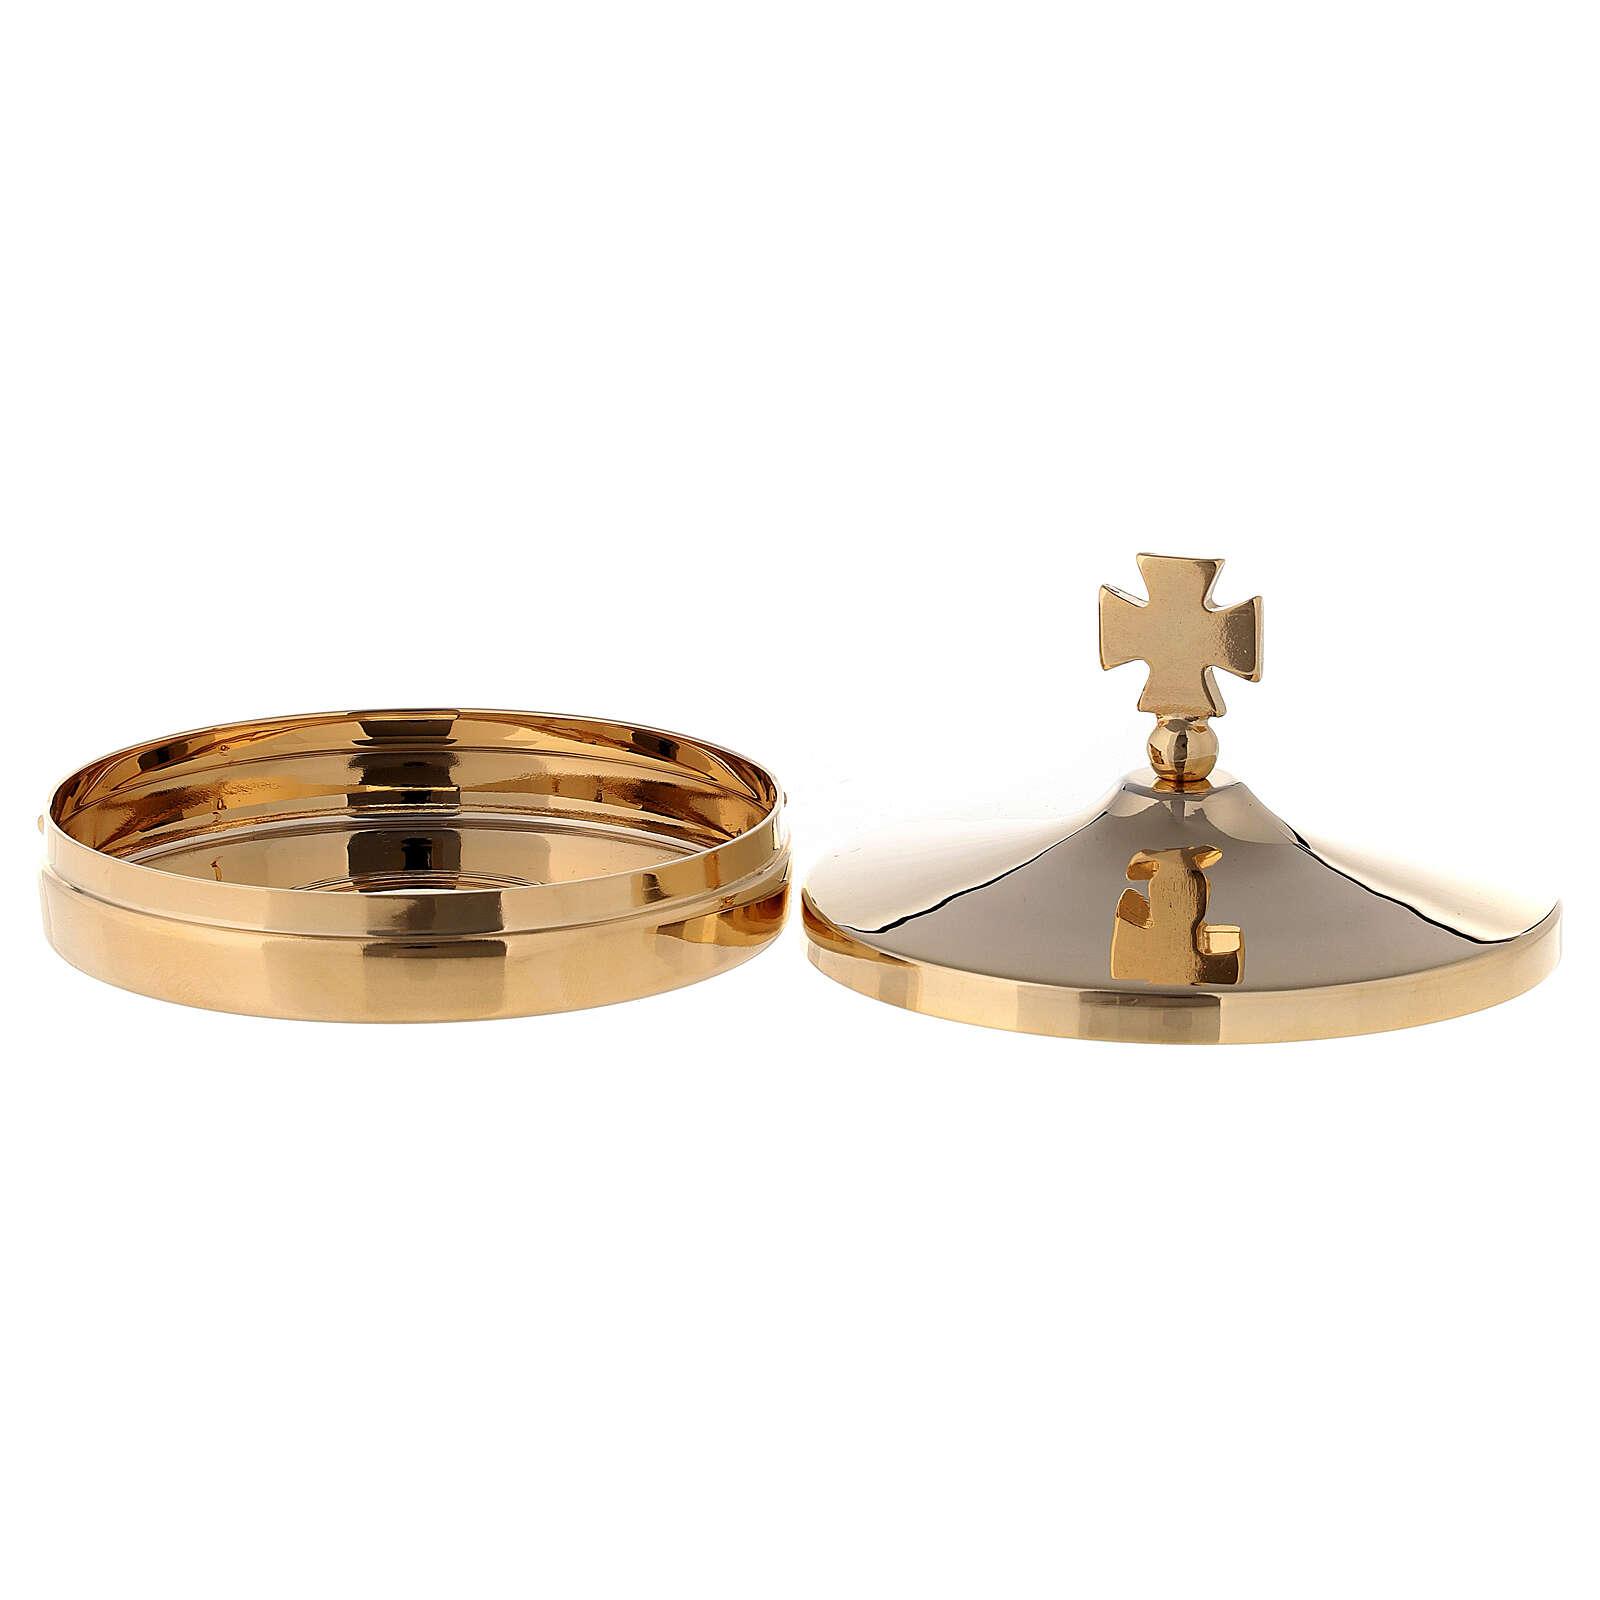 Communion host box diam 8 cm in 24k gold plated brass 3